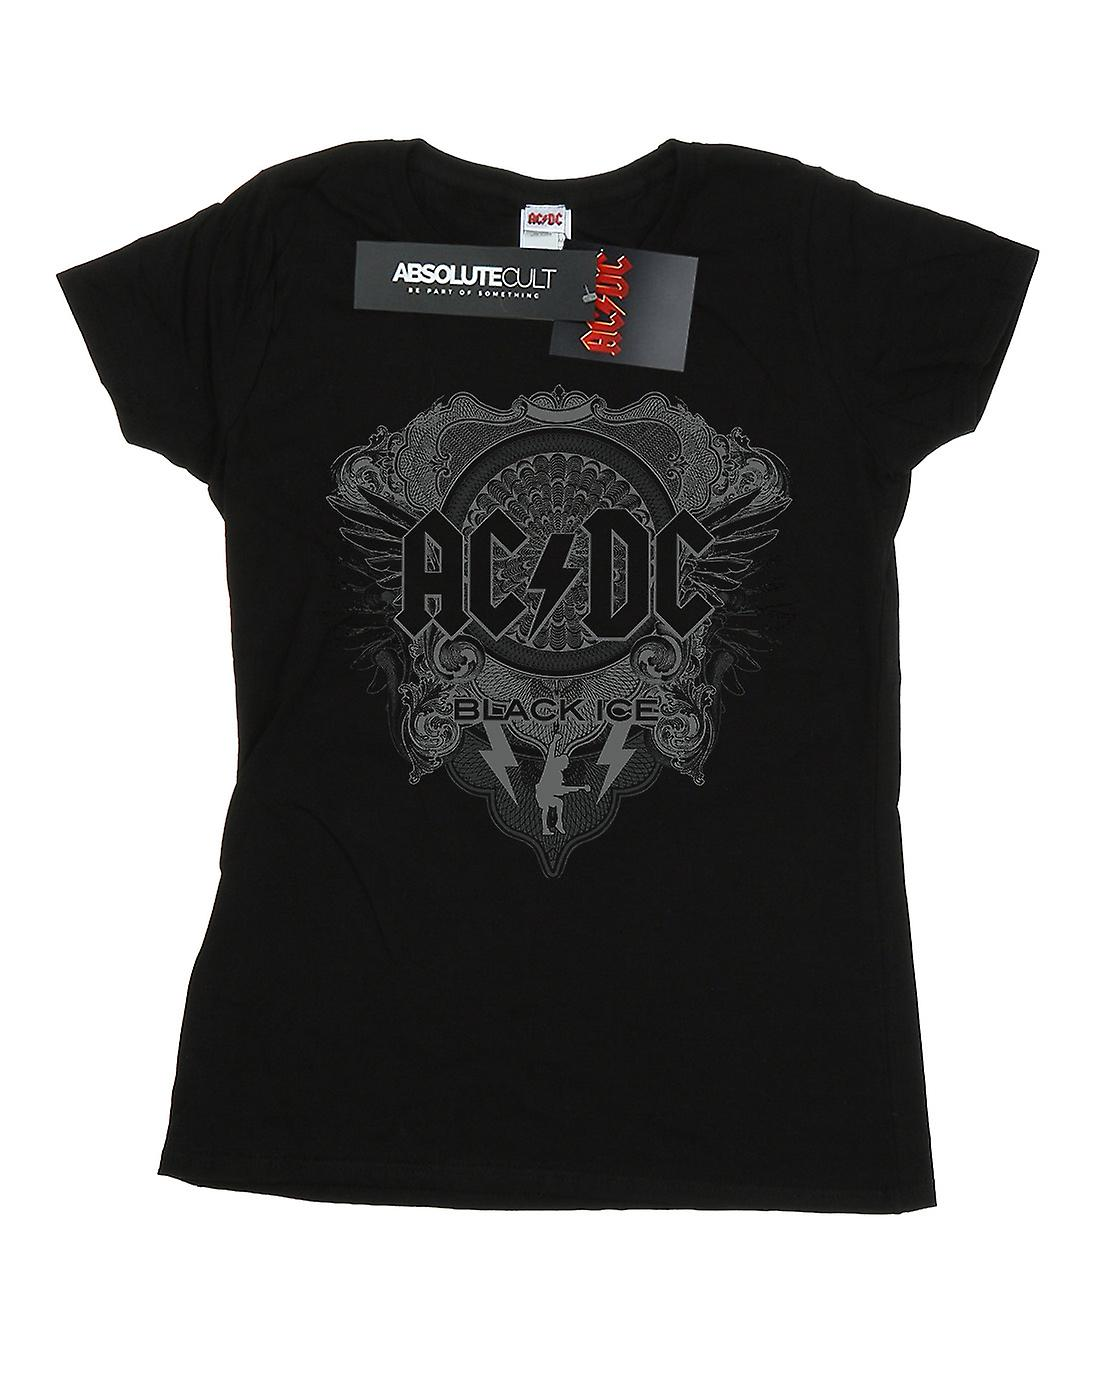 AC/DC Women's Black Ice T-Shirt